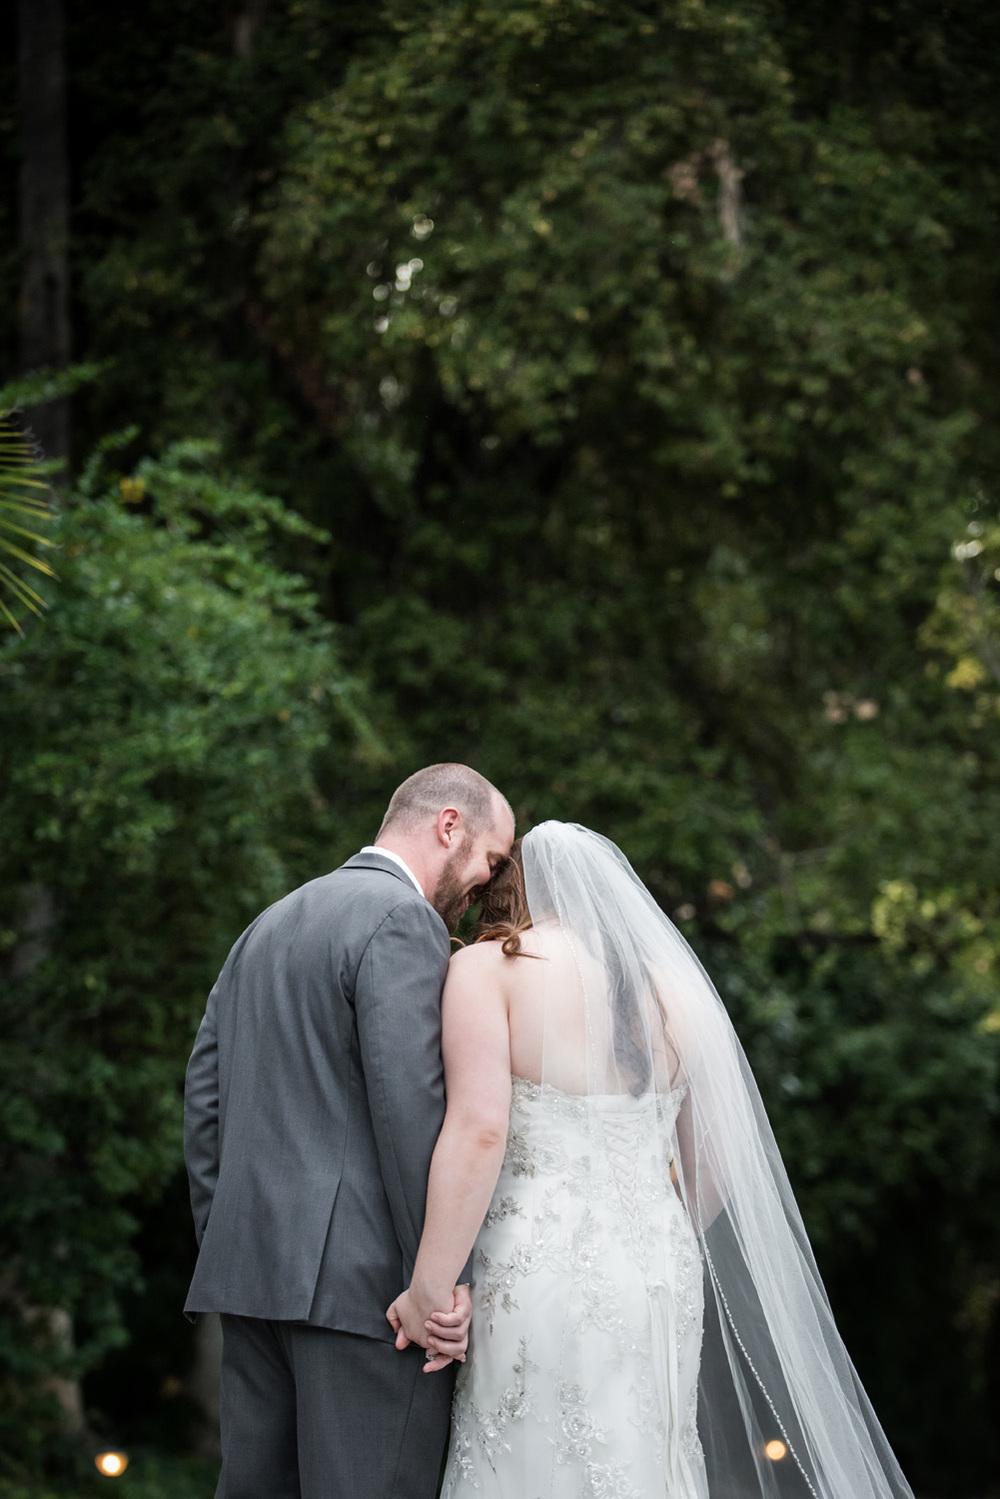 redlands_wedding_couple_holdinghands_realwedding